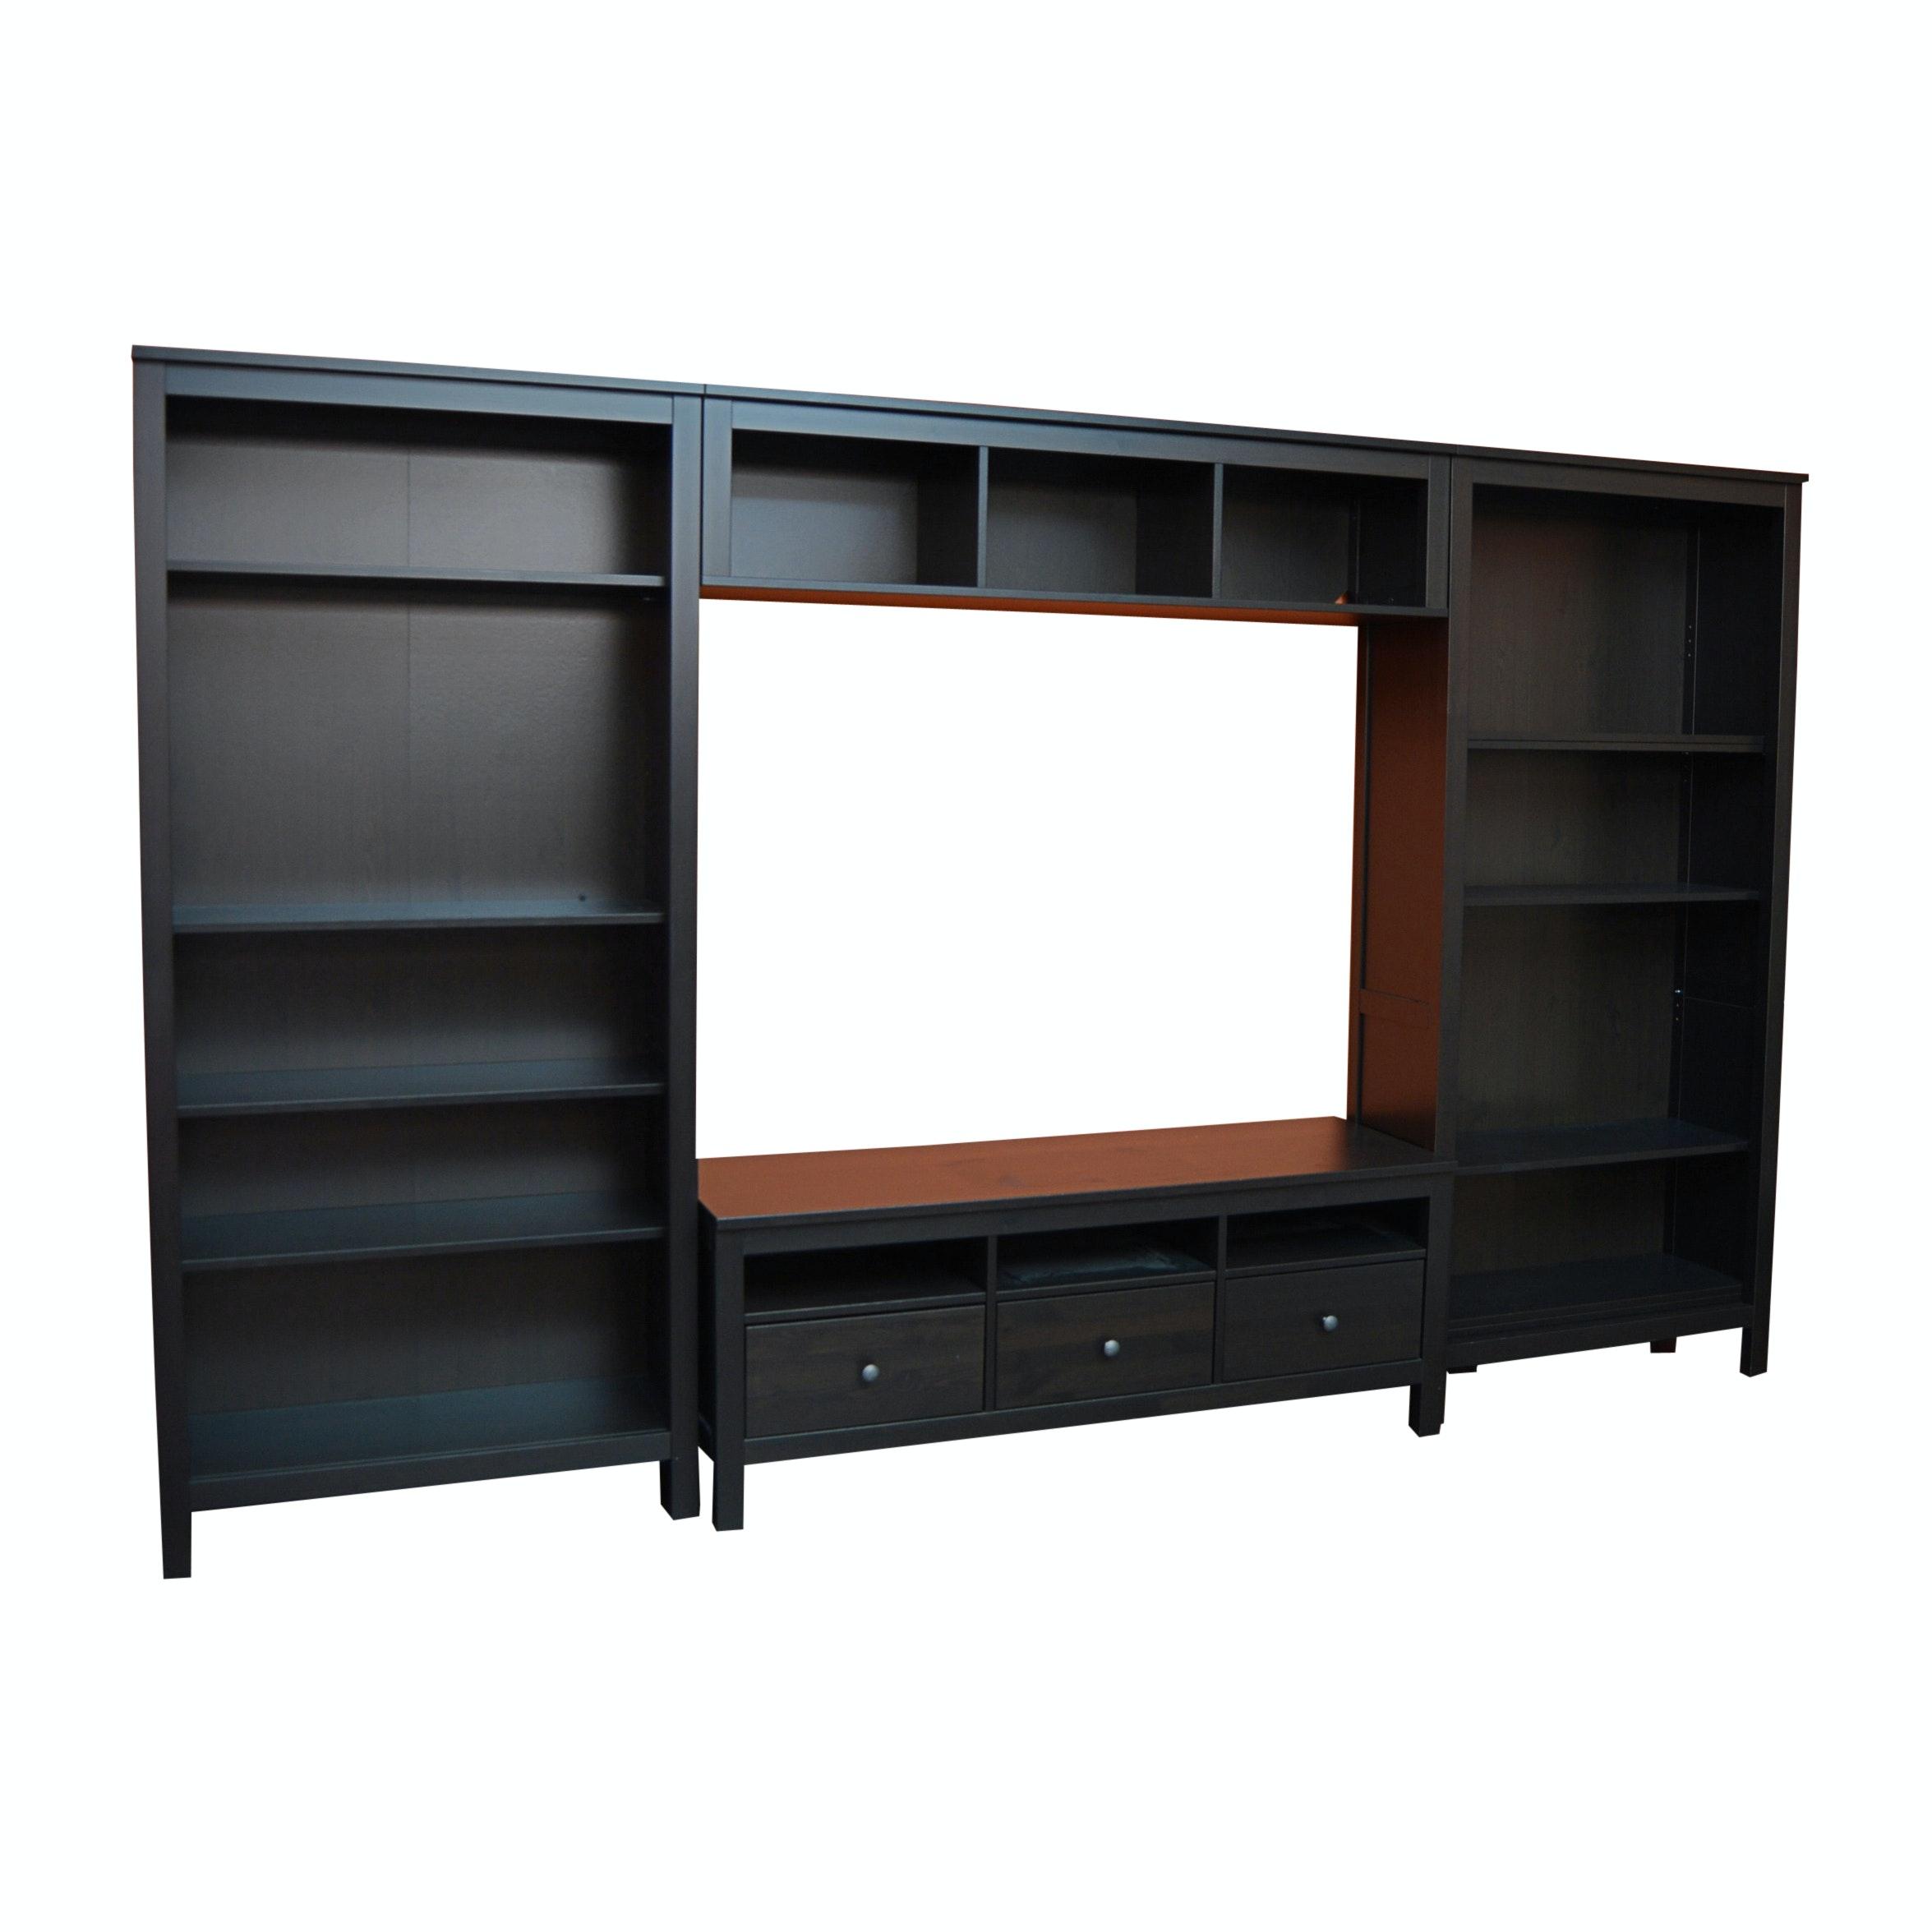 Ikea Bookcase Wall Units